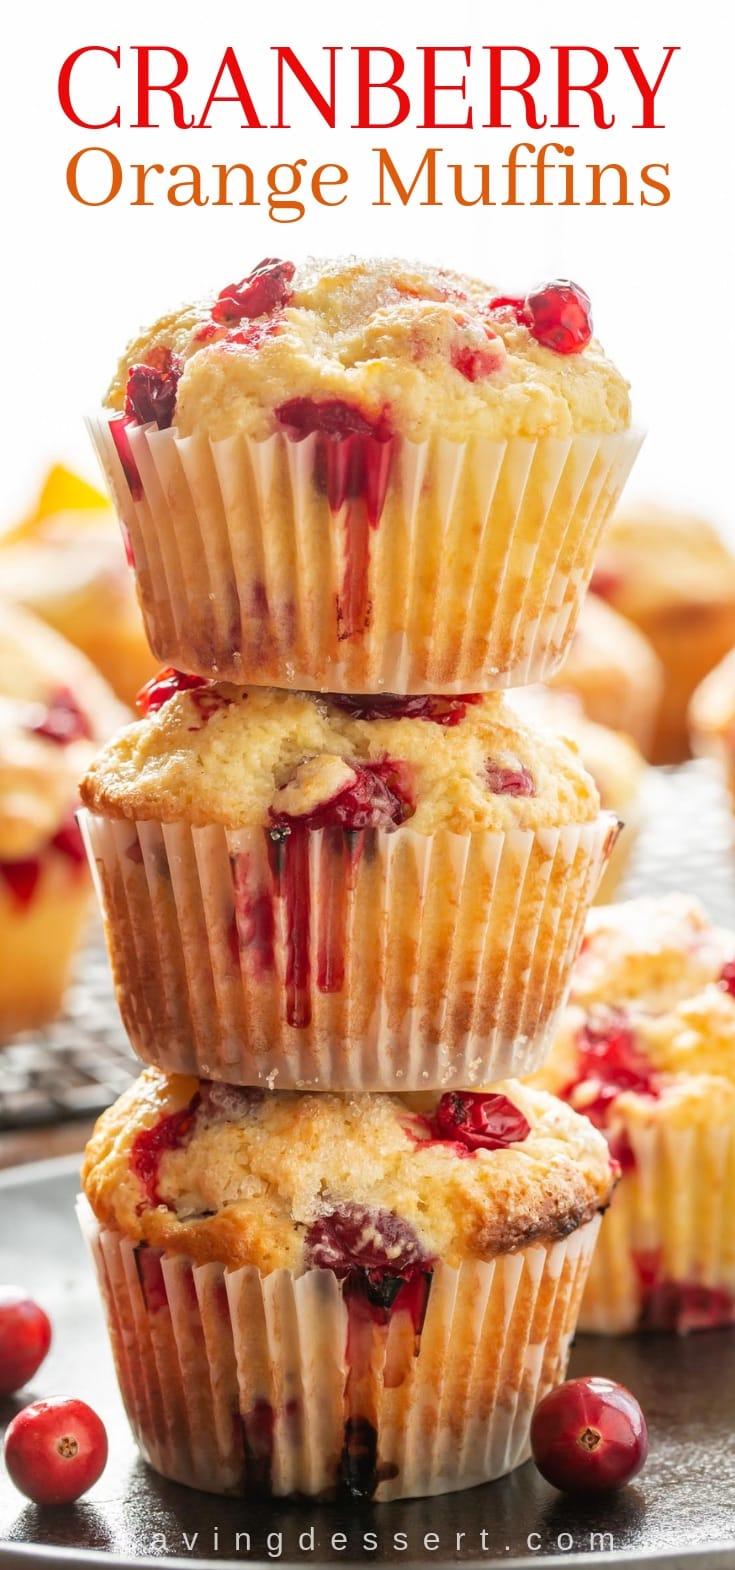 A stack of three cranberry orange muffins